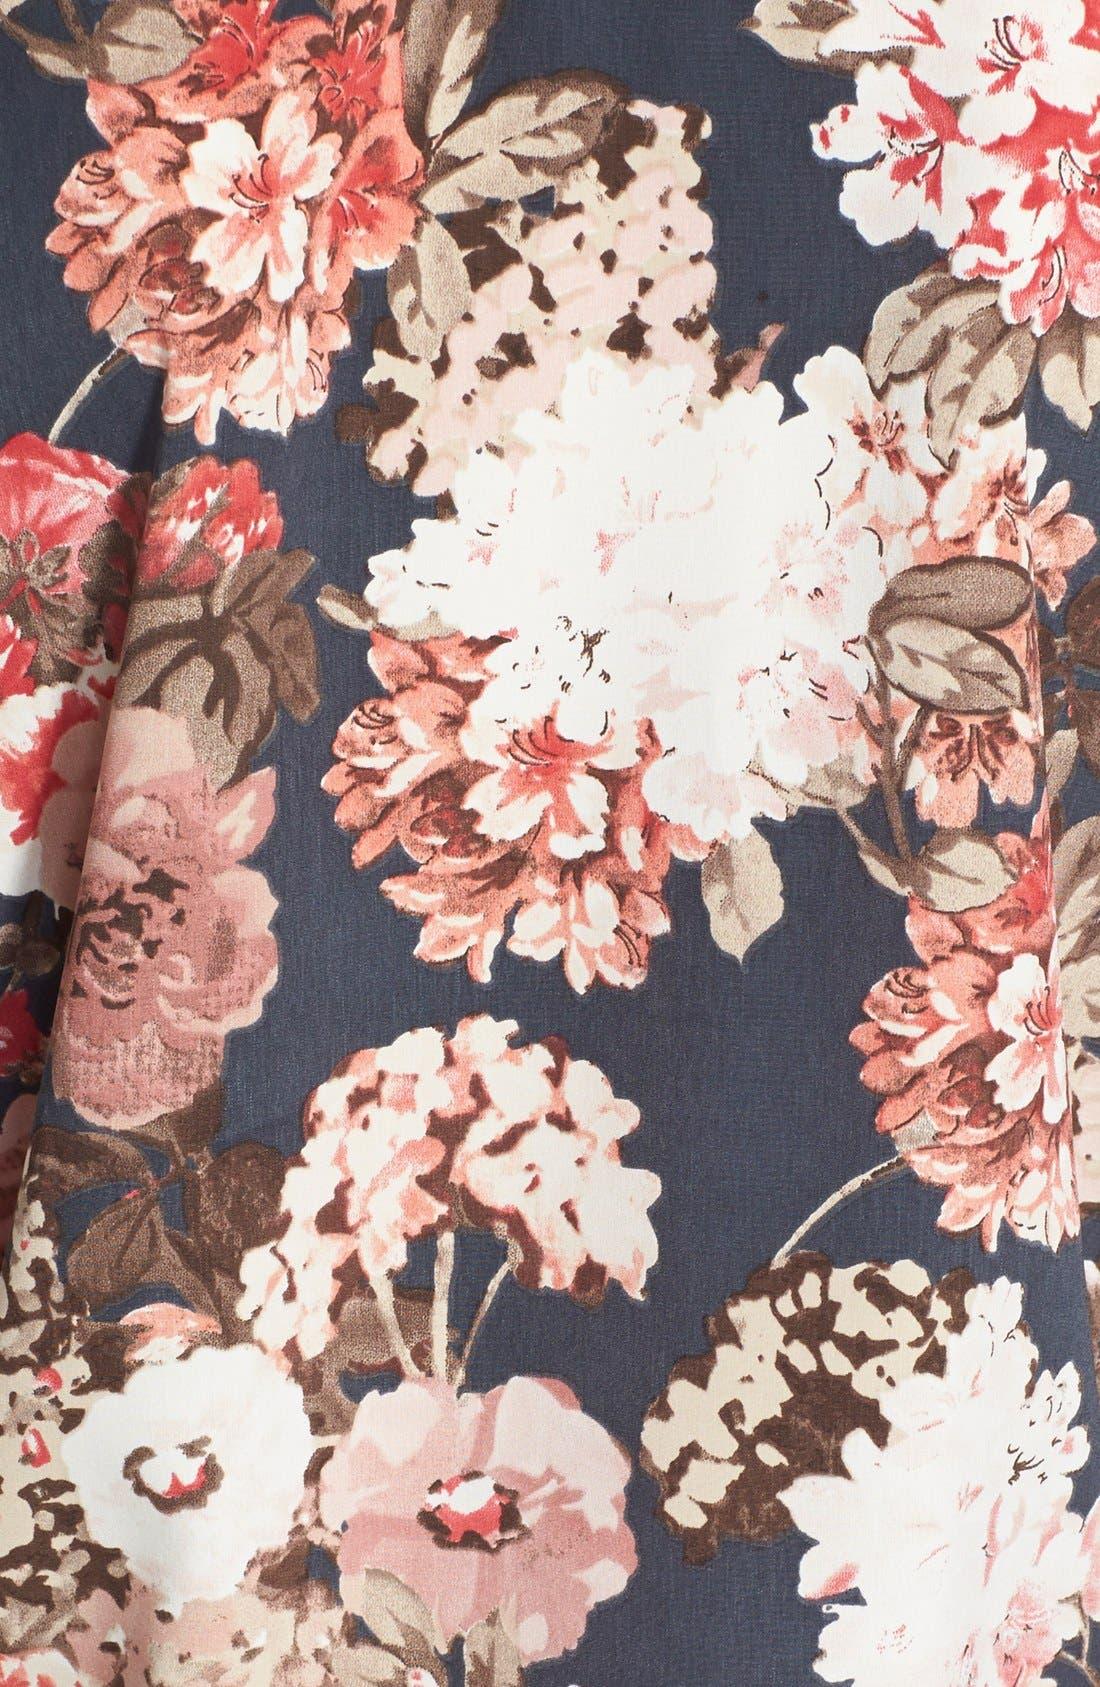 Floral Print Raglan Sweatshirt,                             Alternate thumbnail 5, color,                             020